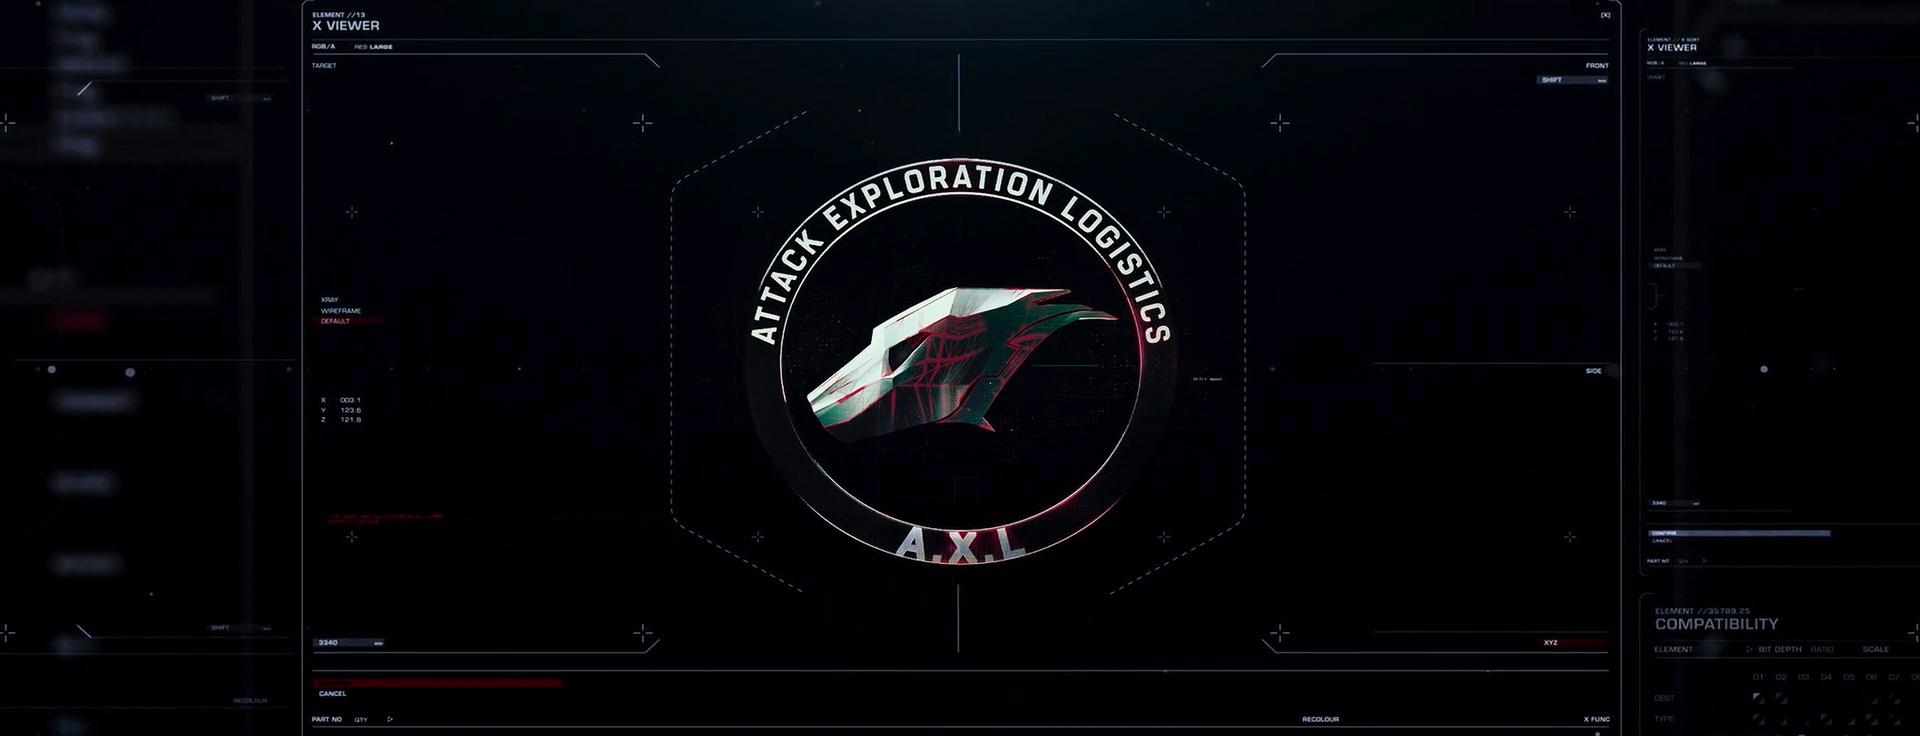 A-X-L_OpeningTitles_11.jpg